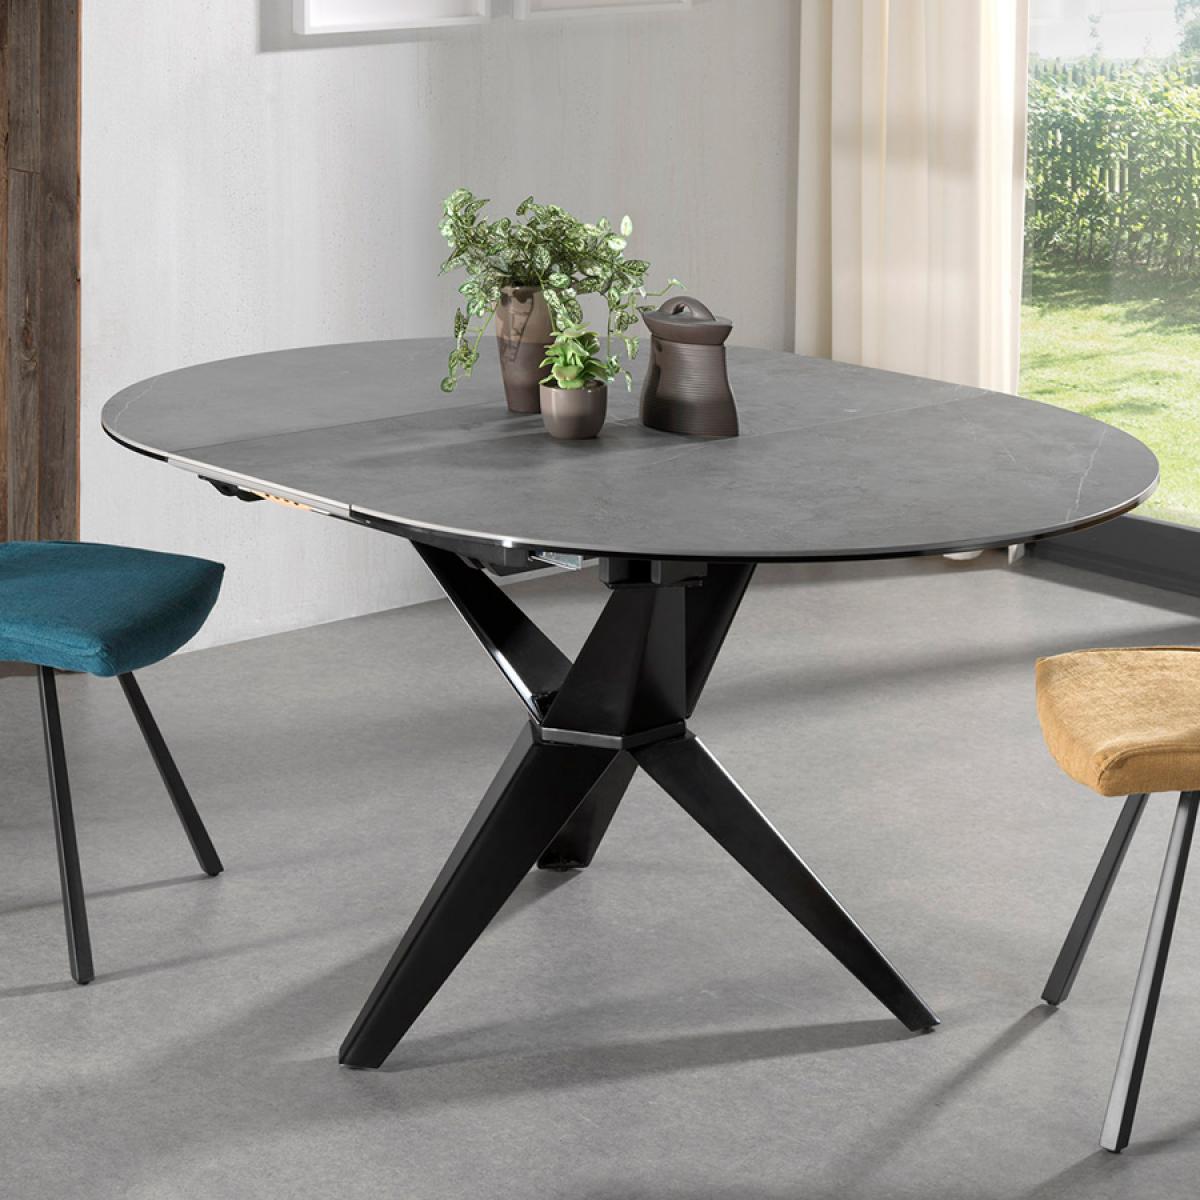 Nouvomeuble Table extensible en céramique grise ESCALONA